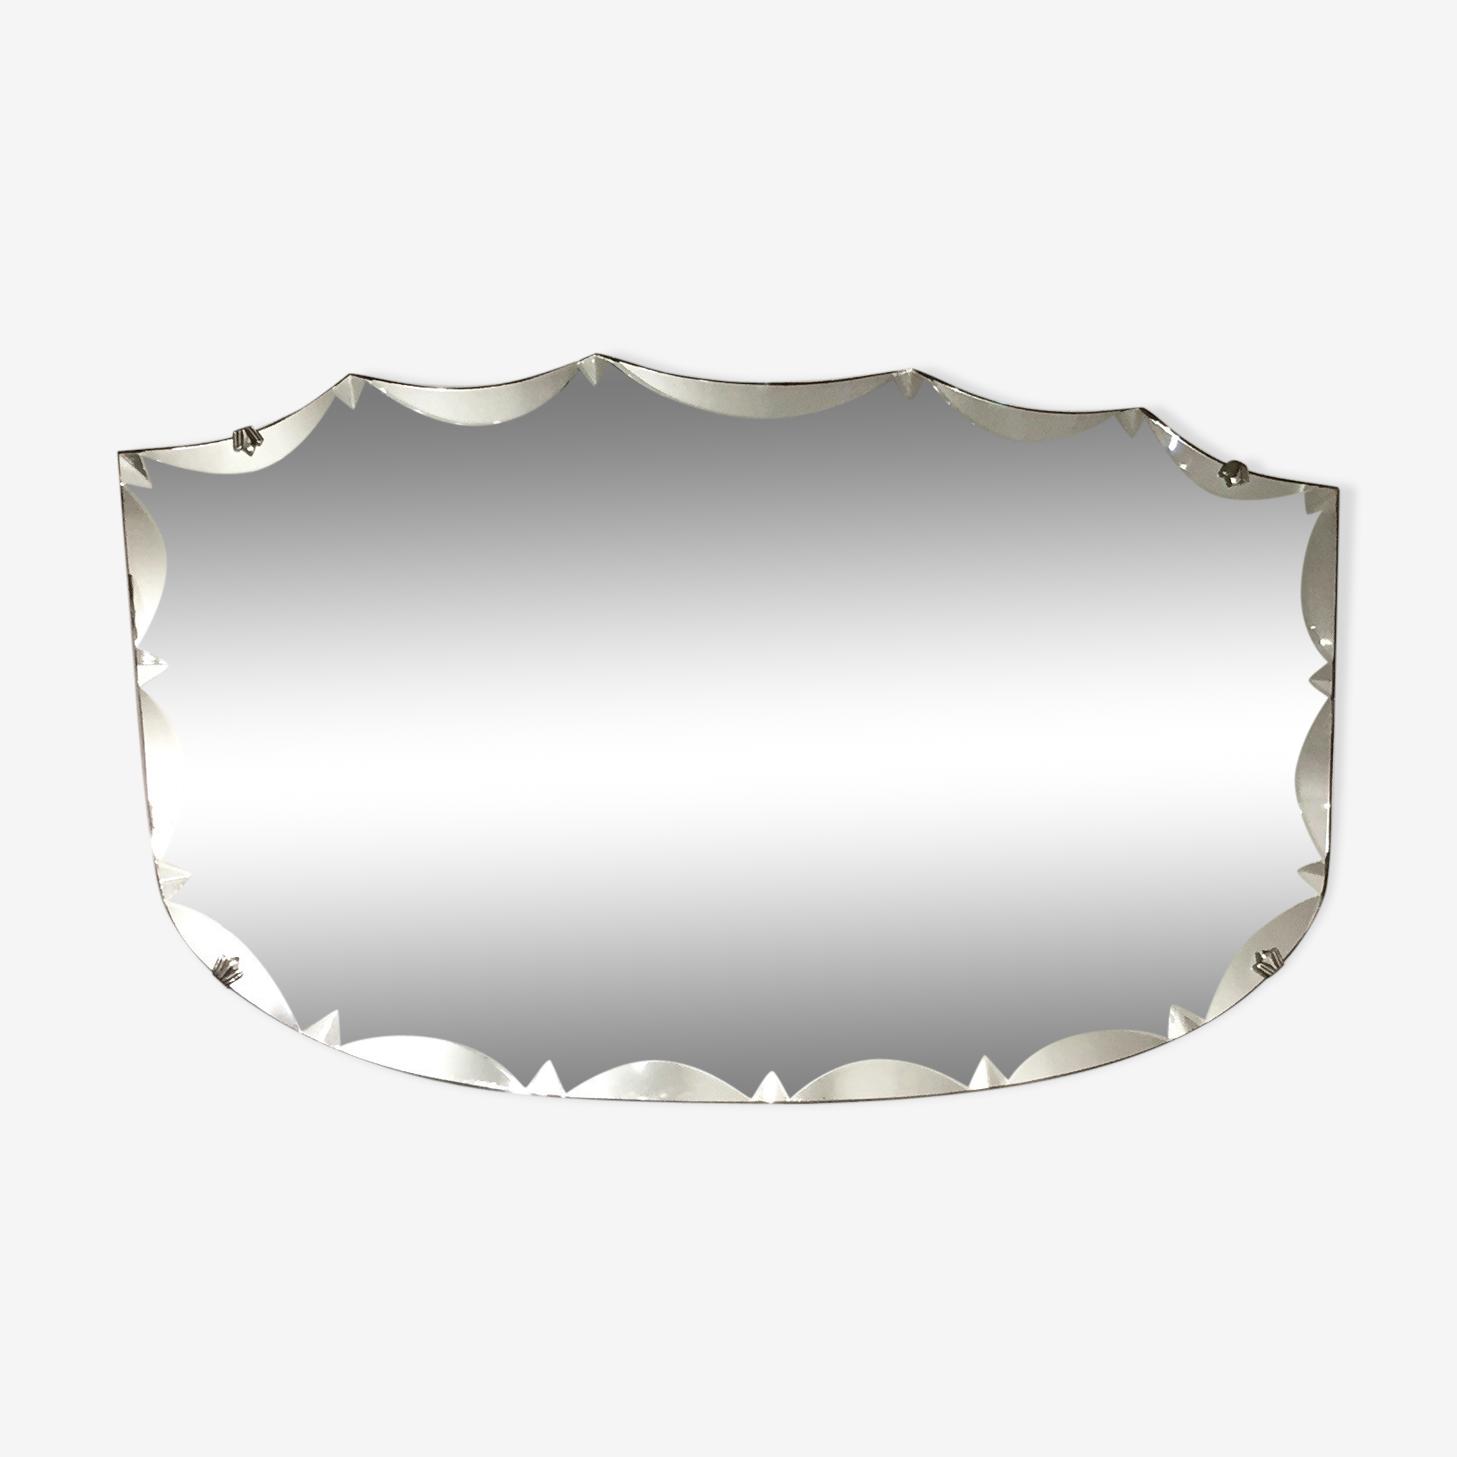 Flared beveled mirror 68 x 40 cm